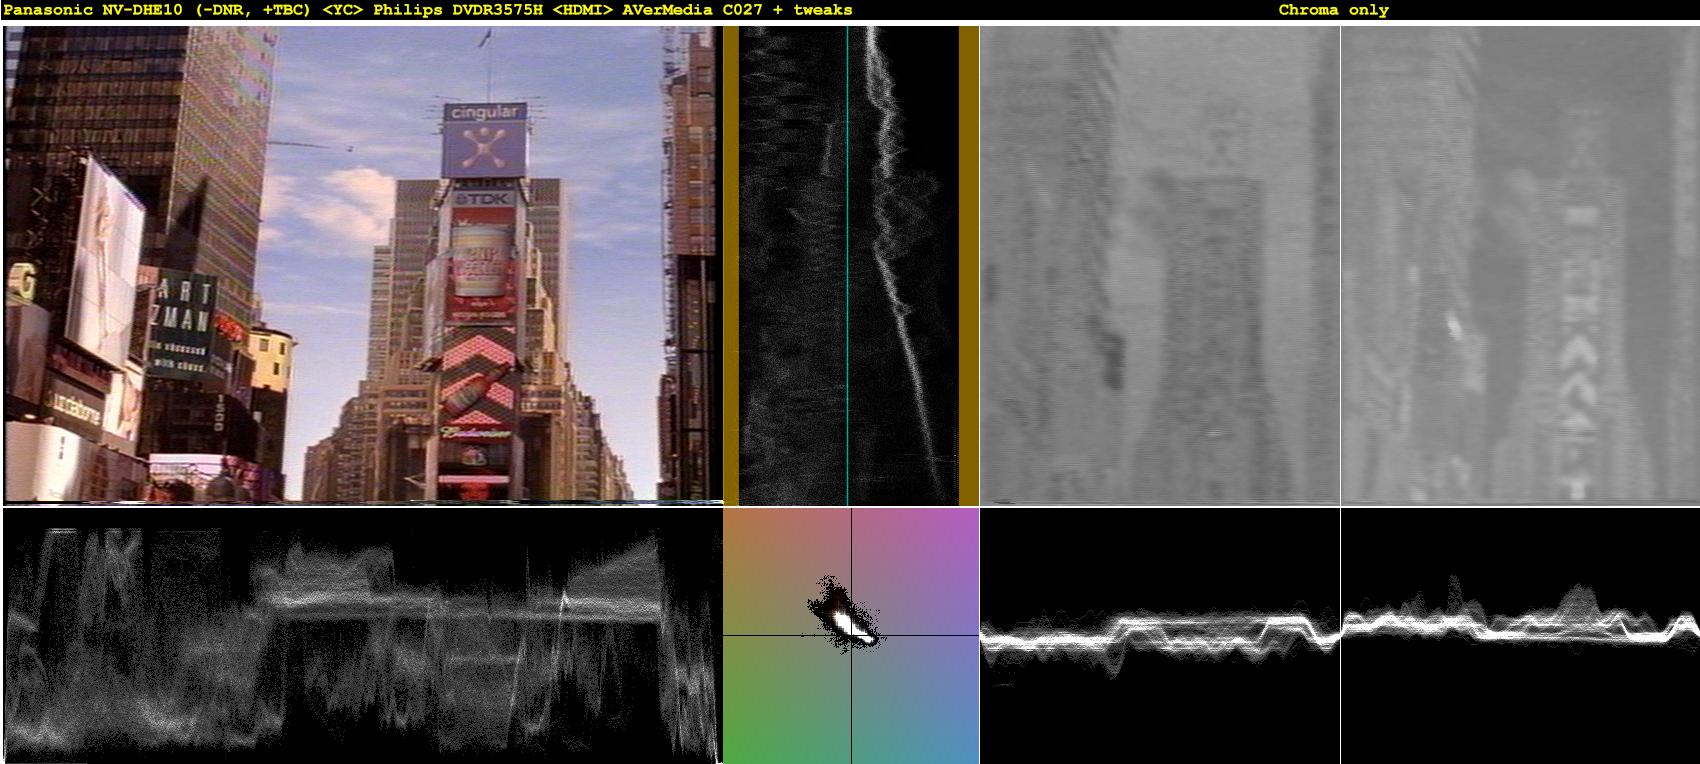 Click image for larger version  Name:1-14-17 - Panasonic NV-DHE10 (-DNR, +TBC).png Views:1575 Size:1.12 MB ID:37999